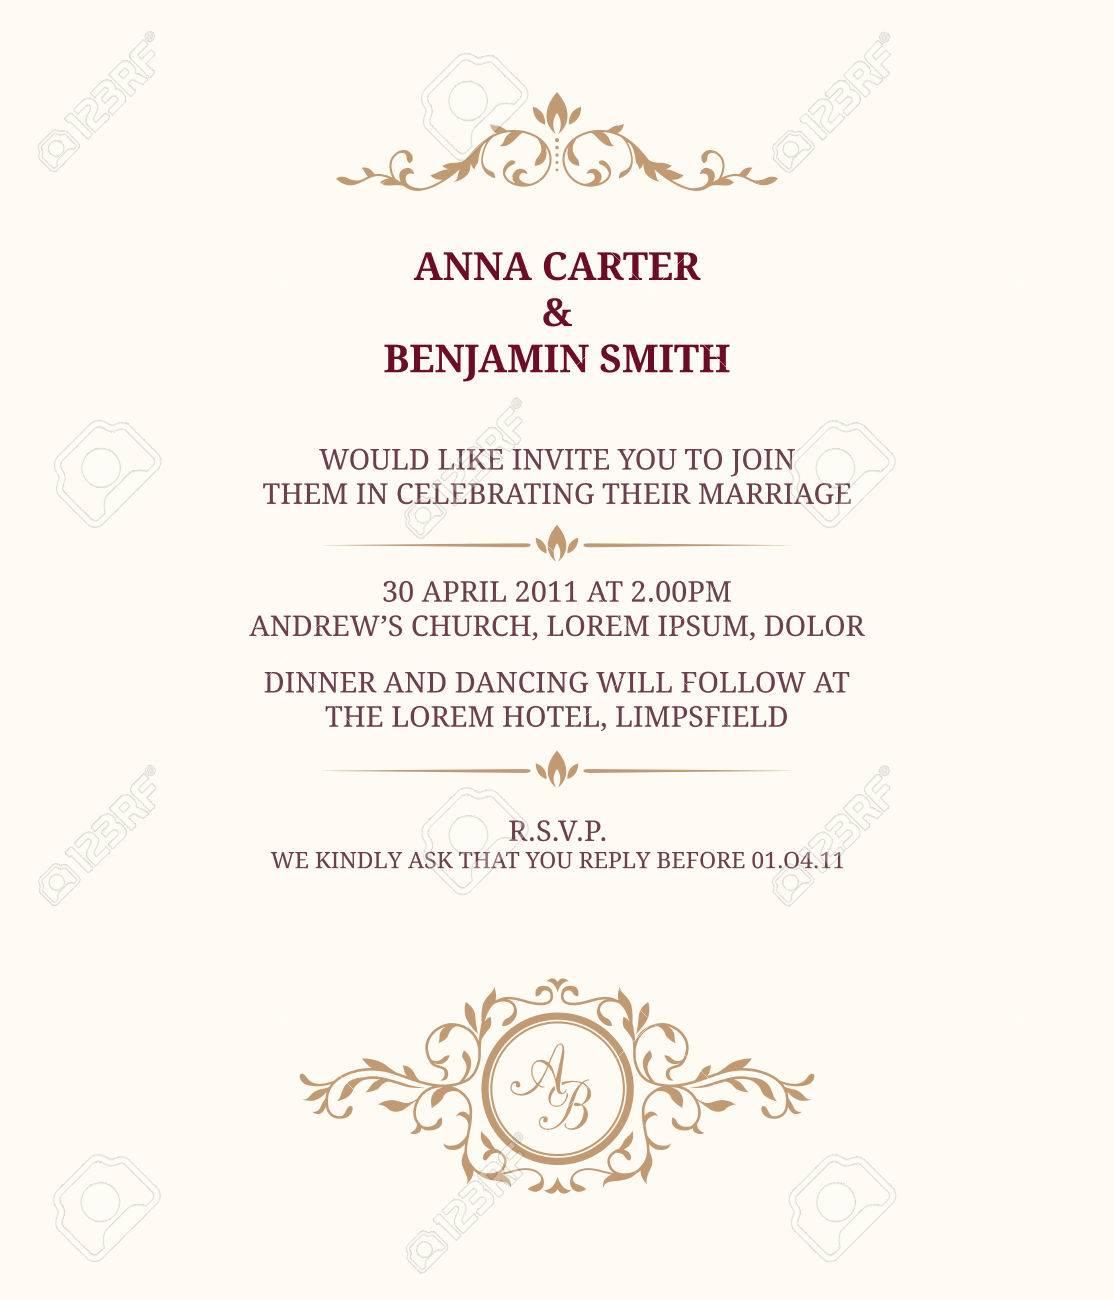 Invitation card with monogram. Wedding invitation, Save The Date. Vintage invitation template. - 57125165